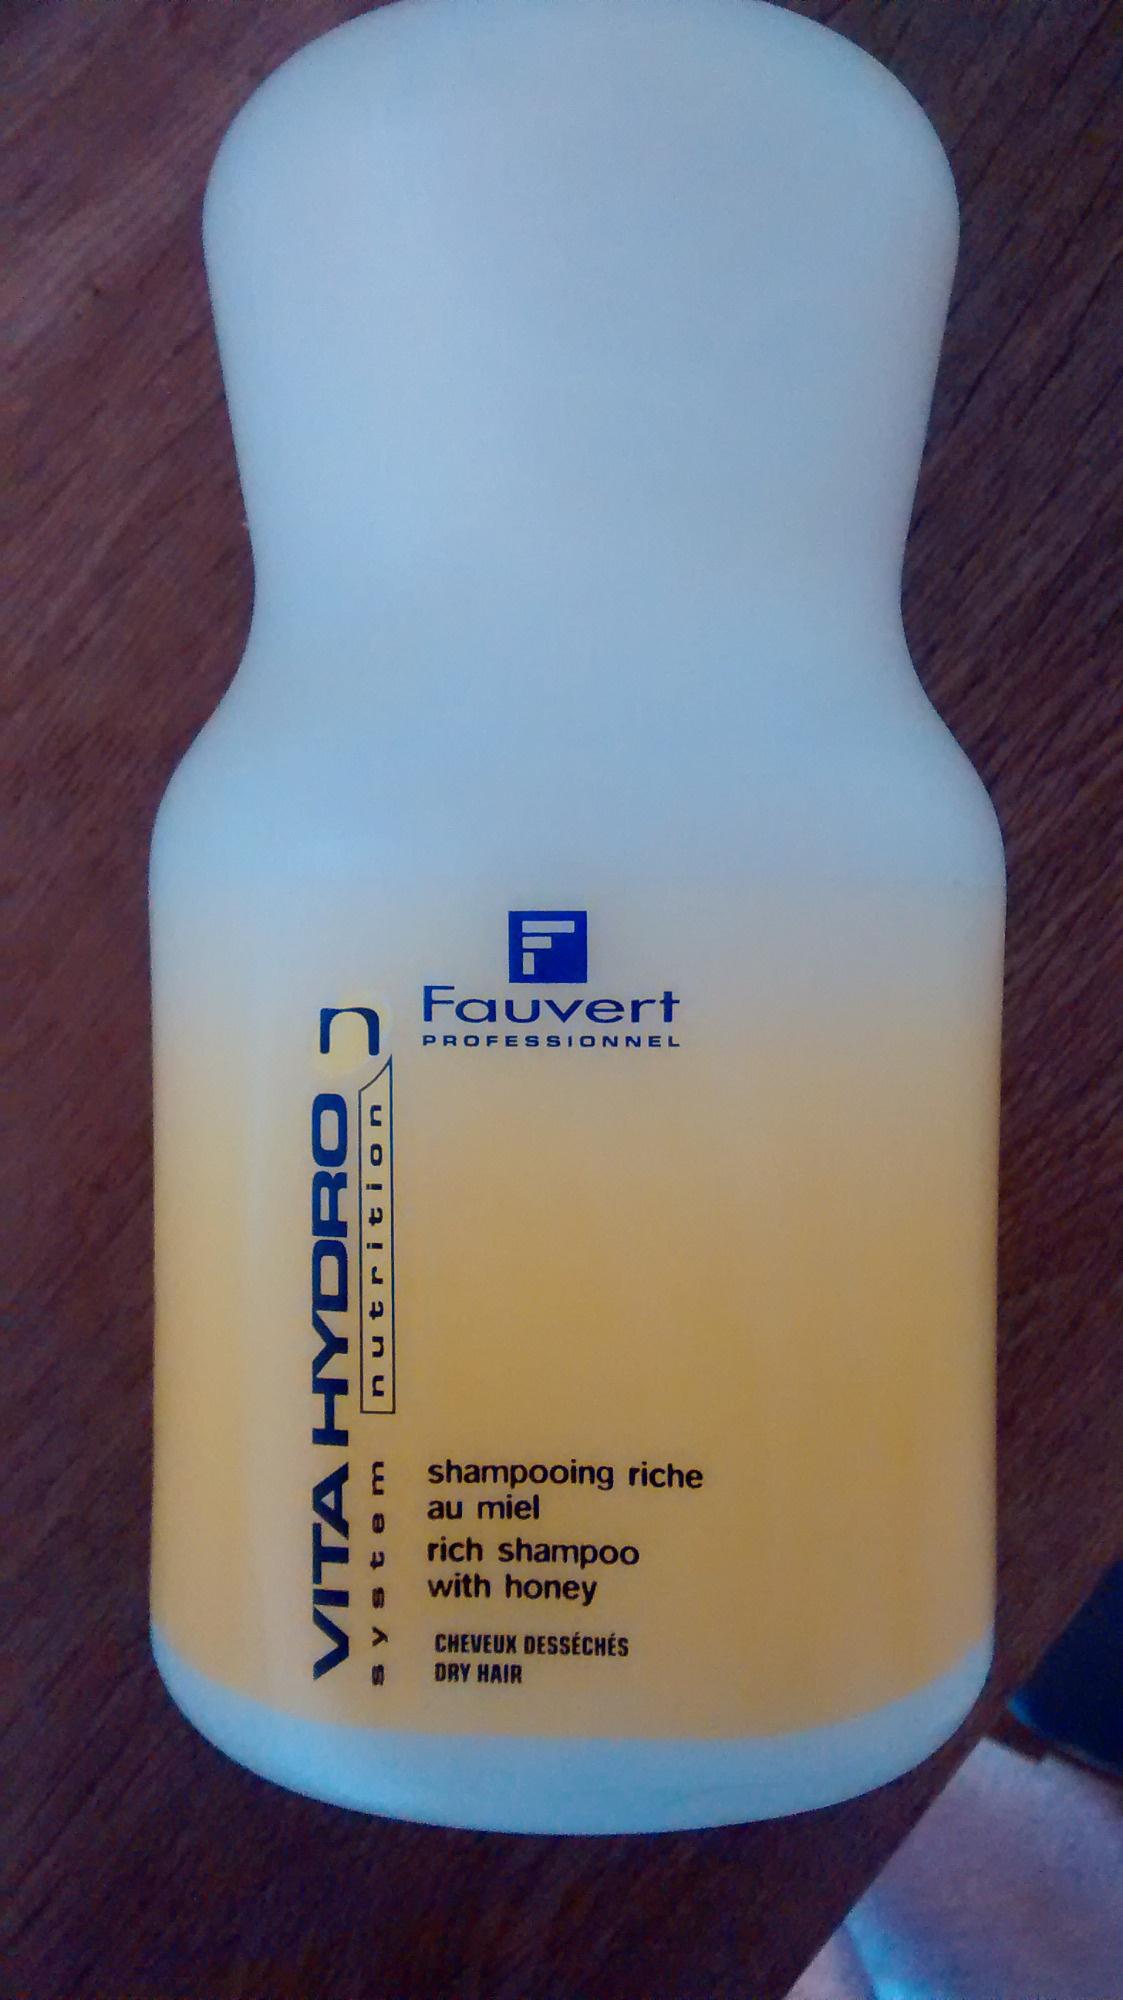 Vita hydro Shampooing riche au miel - Product - fr